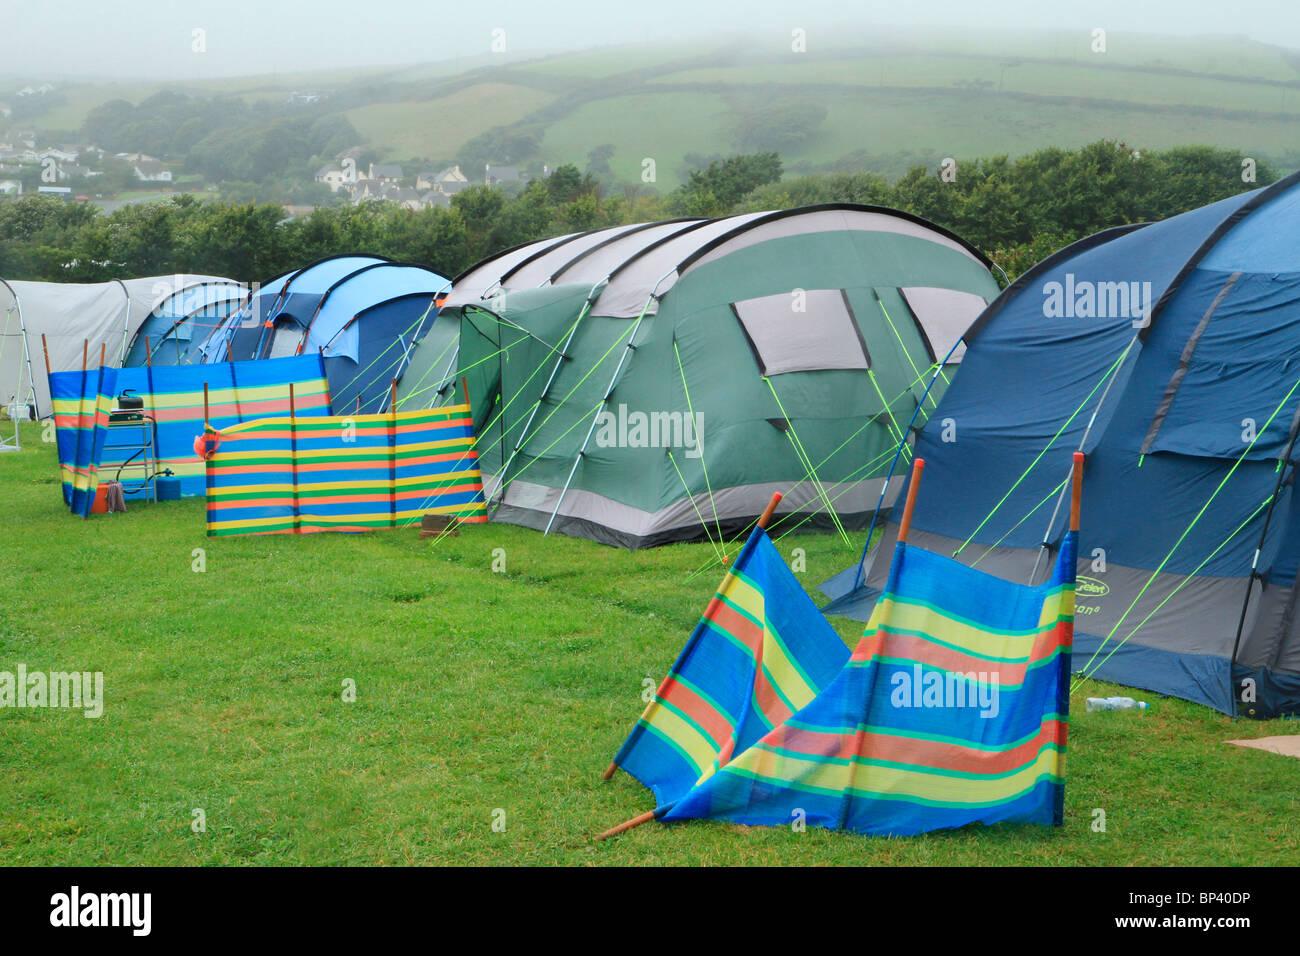 Tents on campsite in rain, England, UK - Stock Image